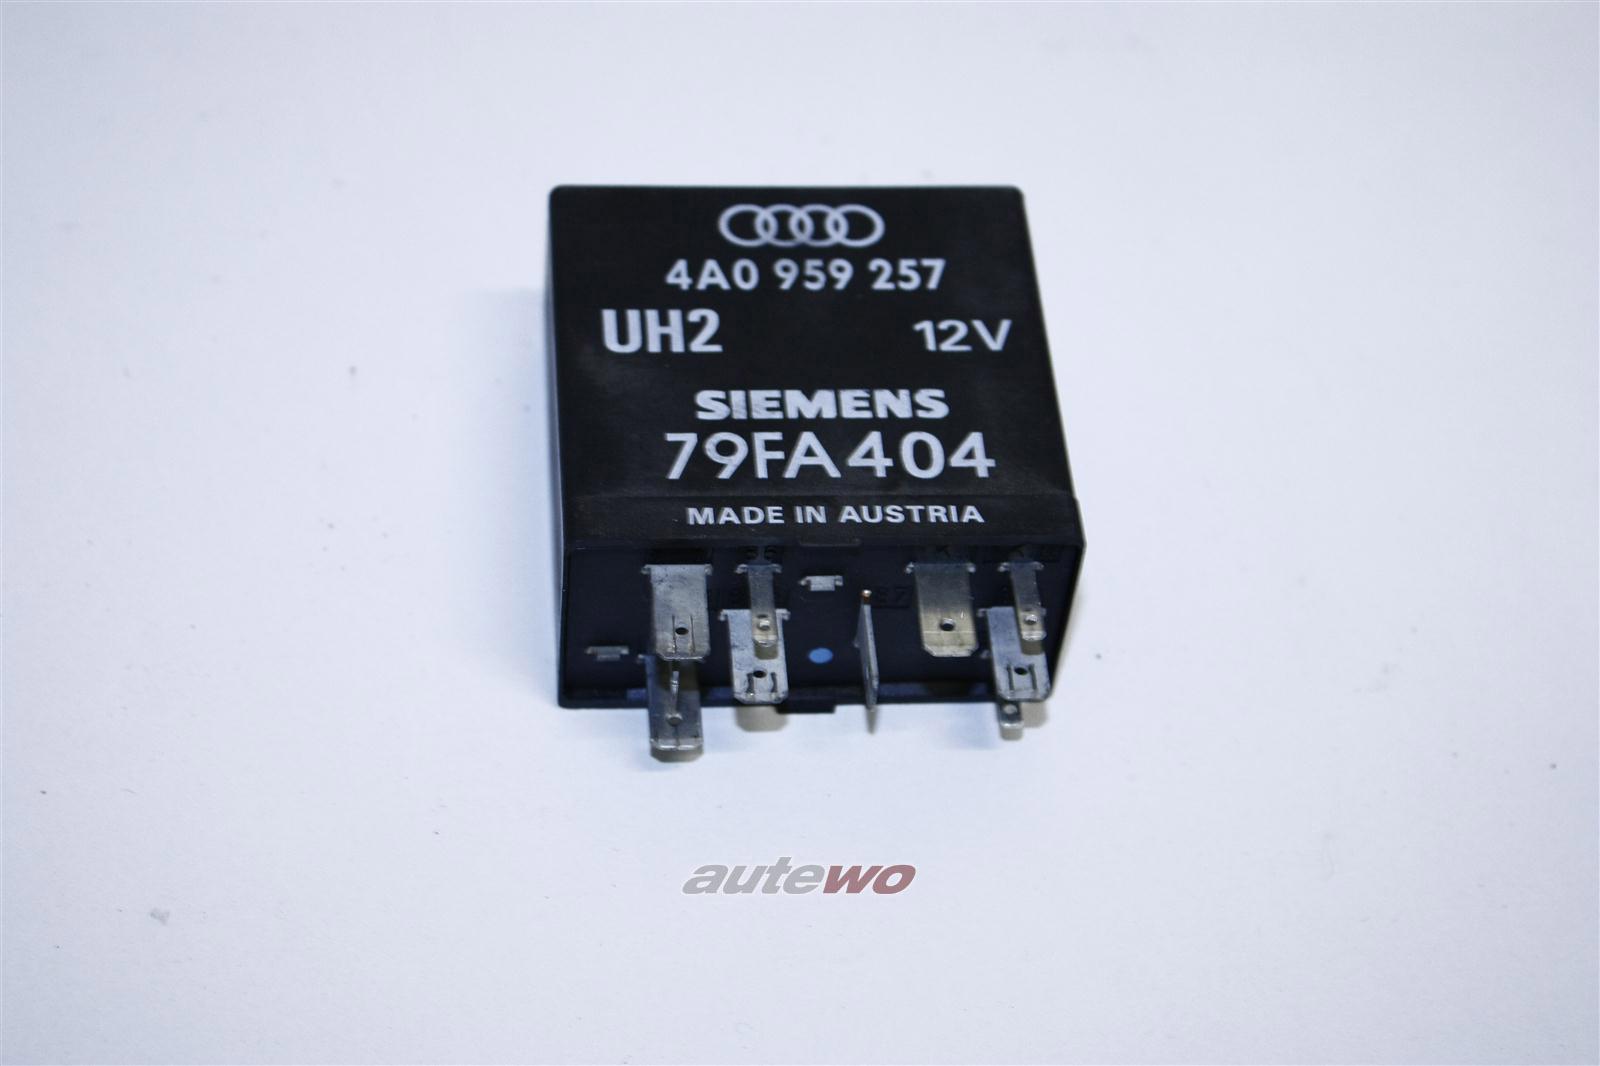 Audi 80/90 Typ 89/B4/100 Typ 44/C4 Steuergerät eFH 363 443959257B 4A0959257